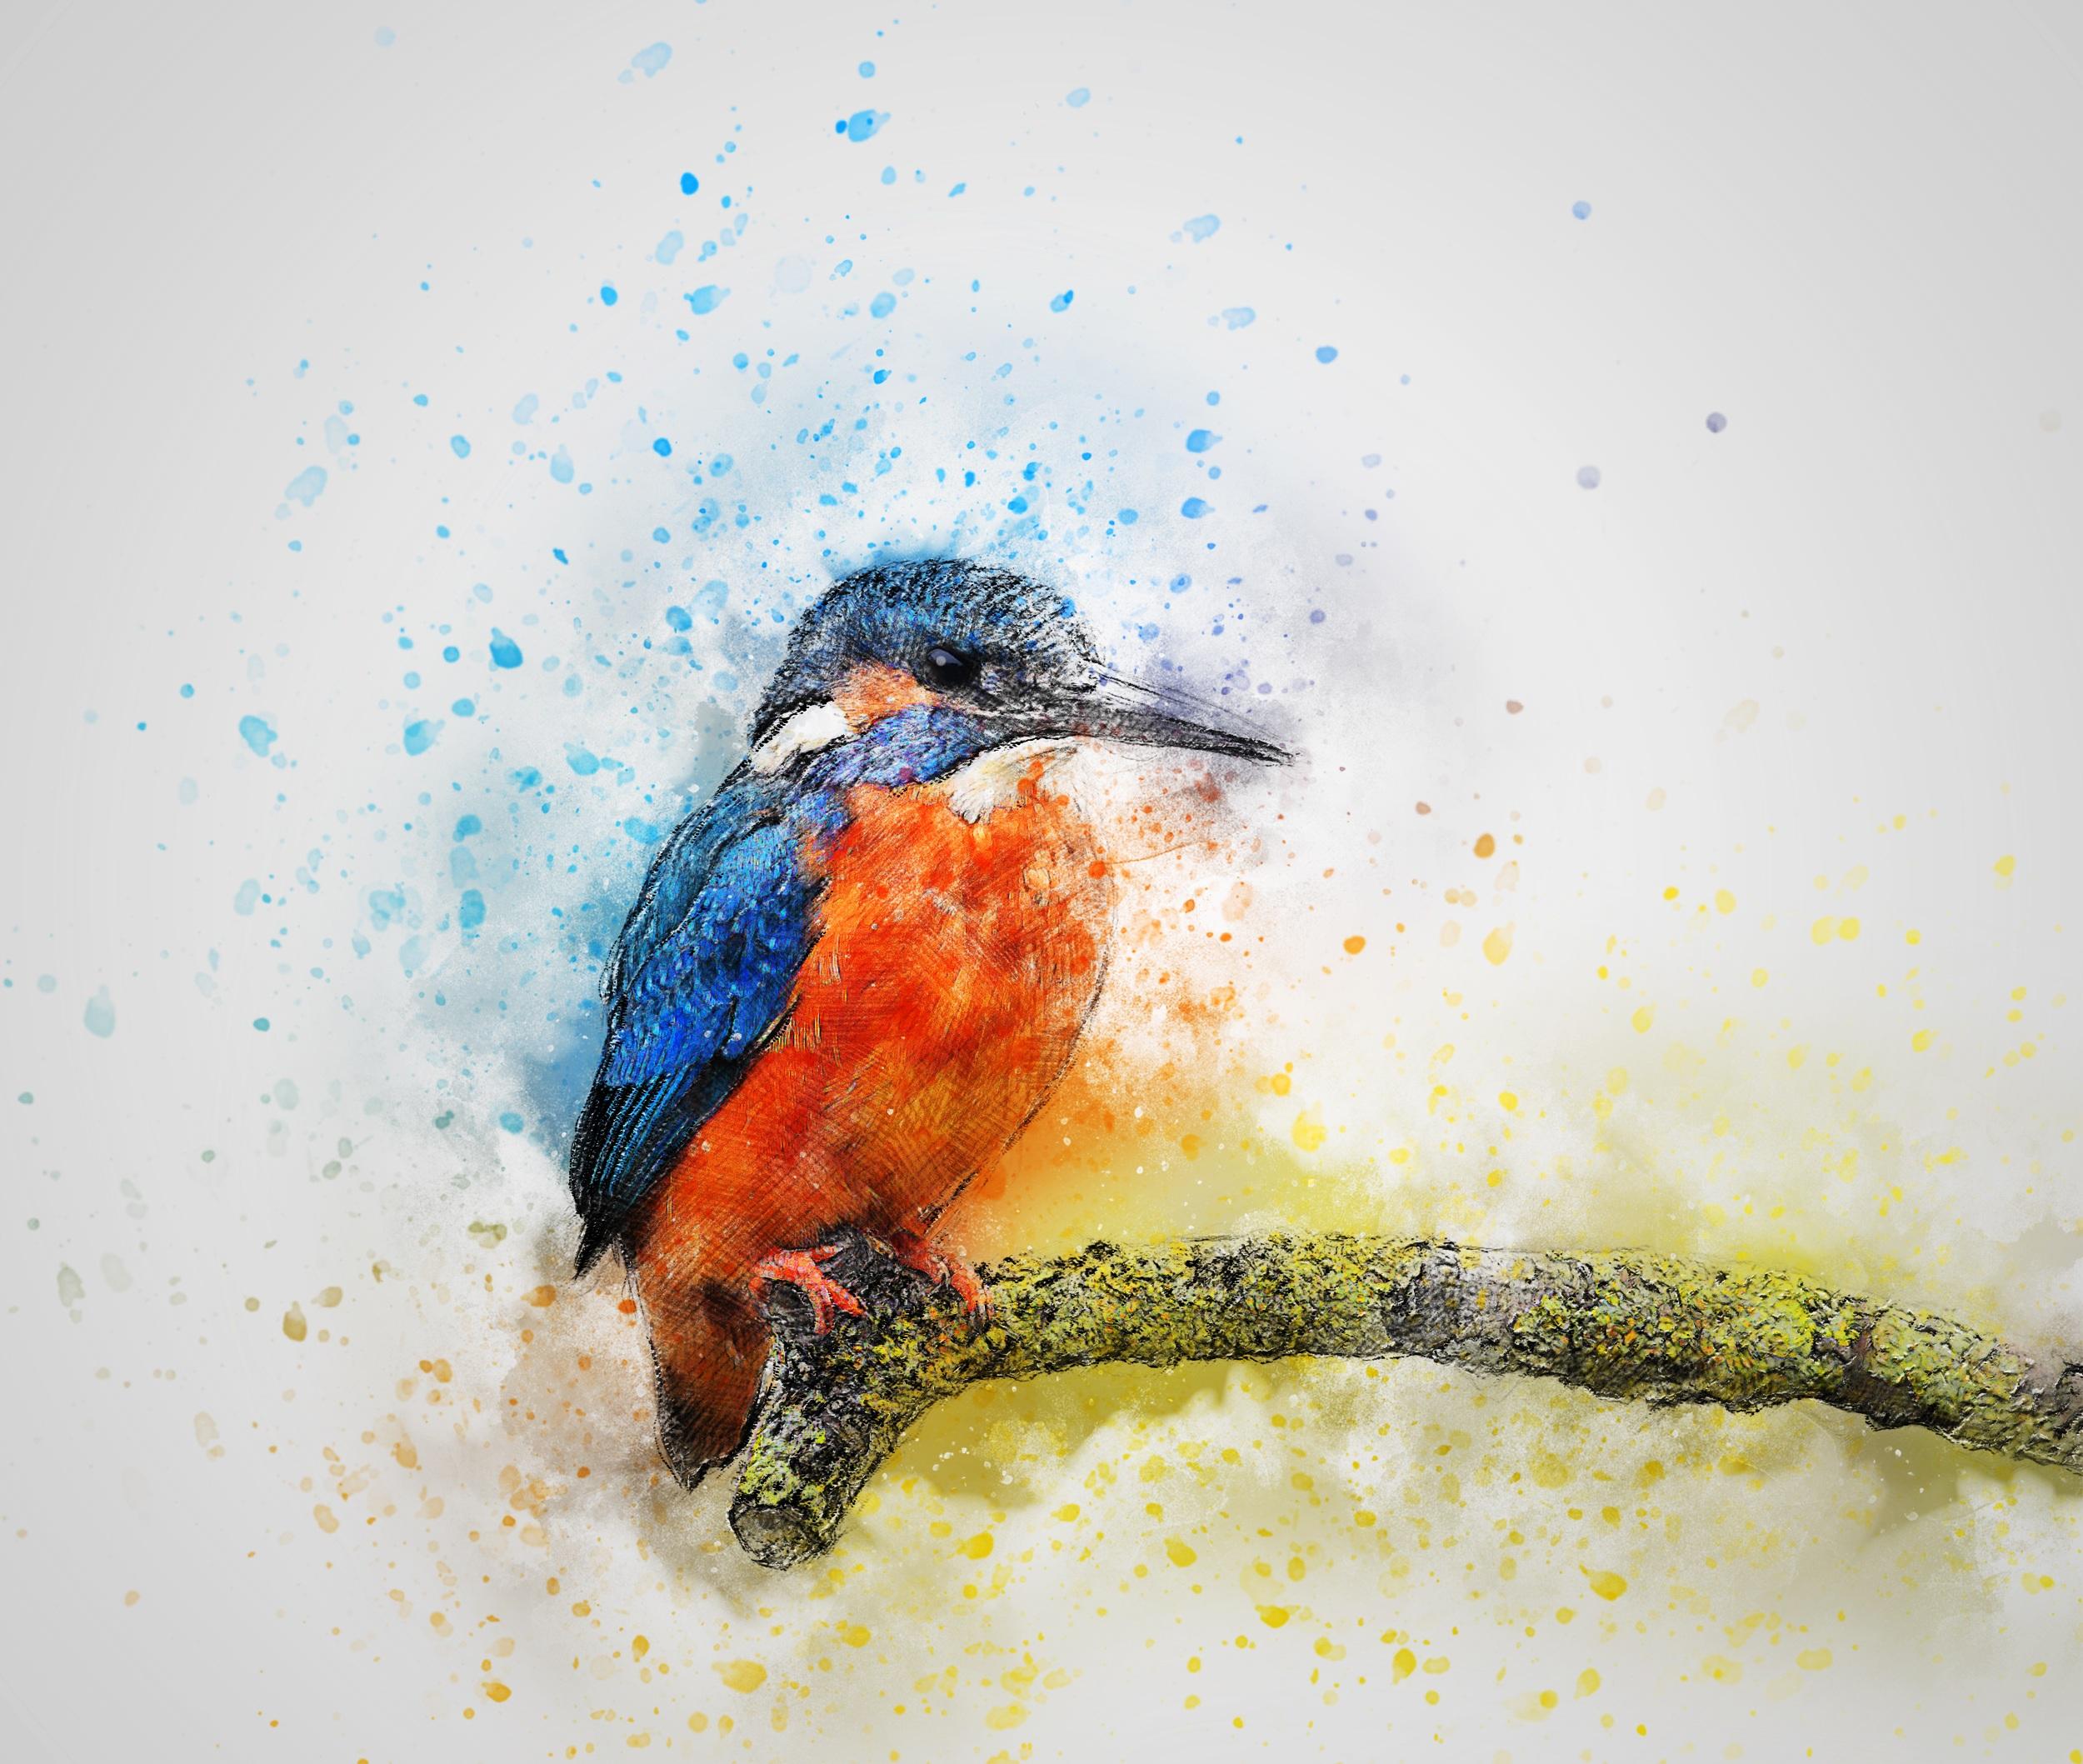 Kingfisher On A Branch Art HD Wallpaper